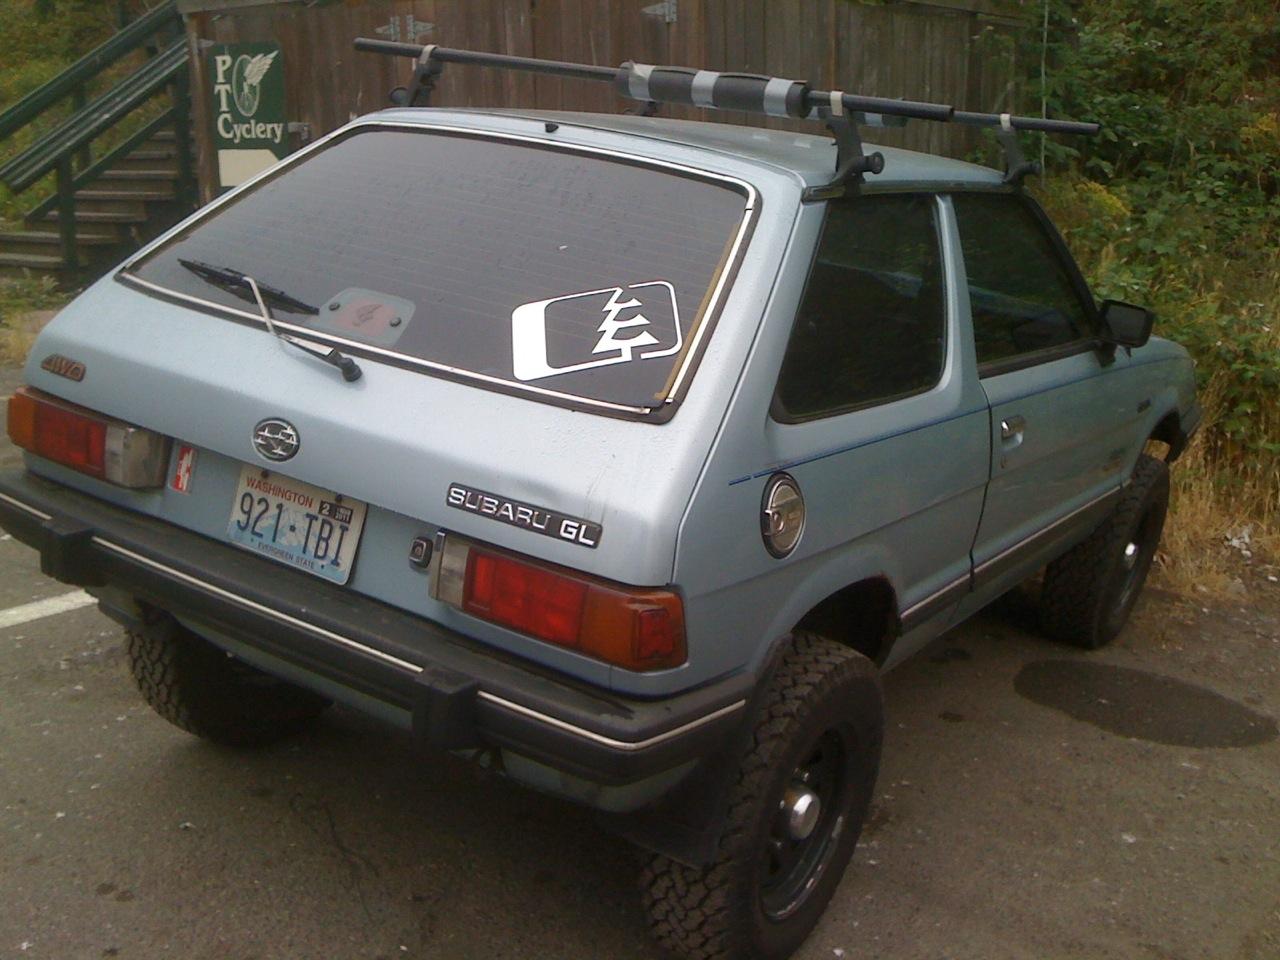 Tamerlane S Thoughts Carspotting 51 Subaru Dl